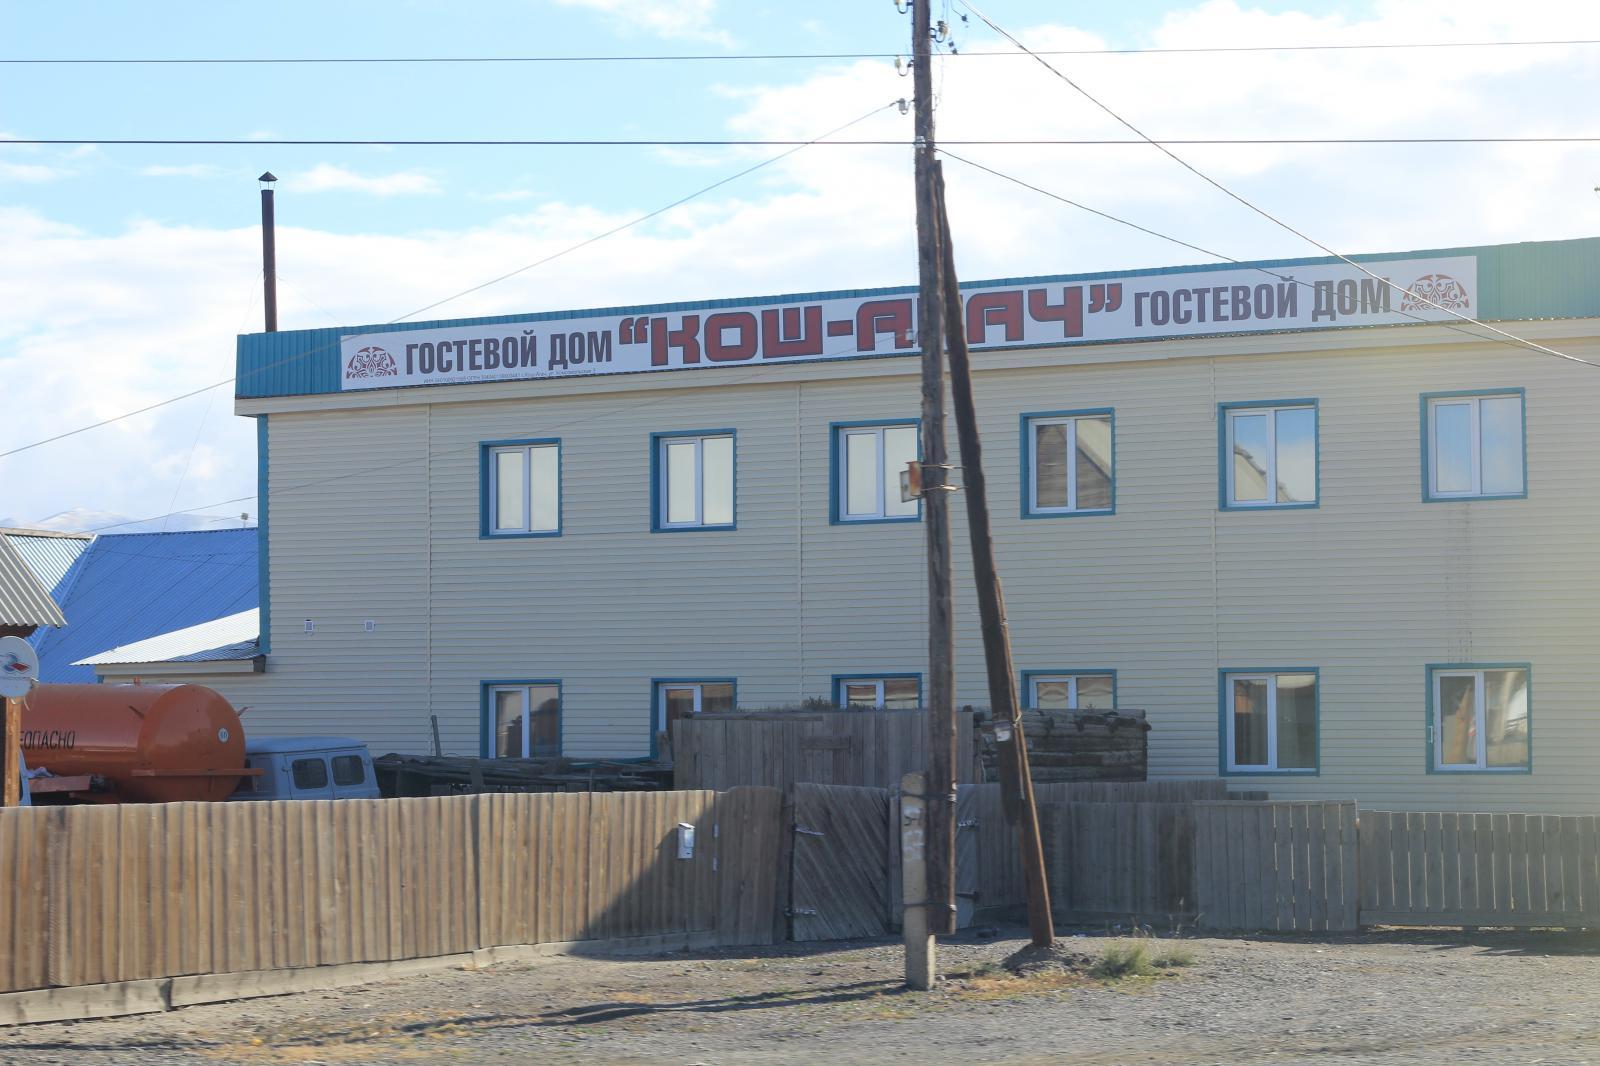 Поселок Кош-Агач (рядом с границей) - IMG_2854.JPG